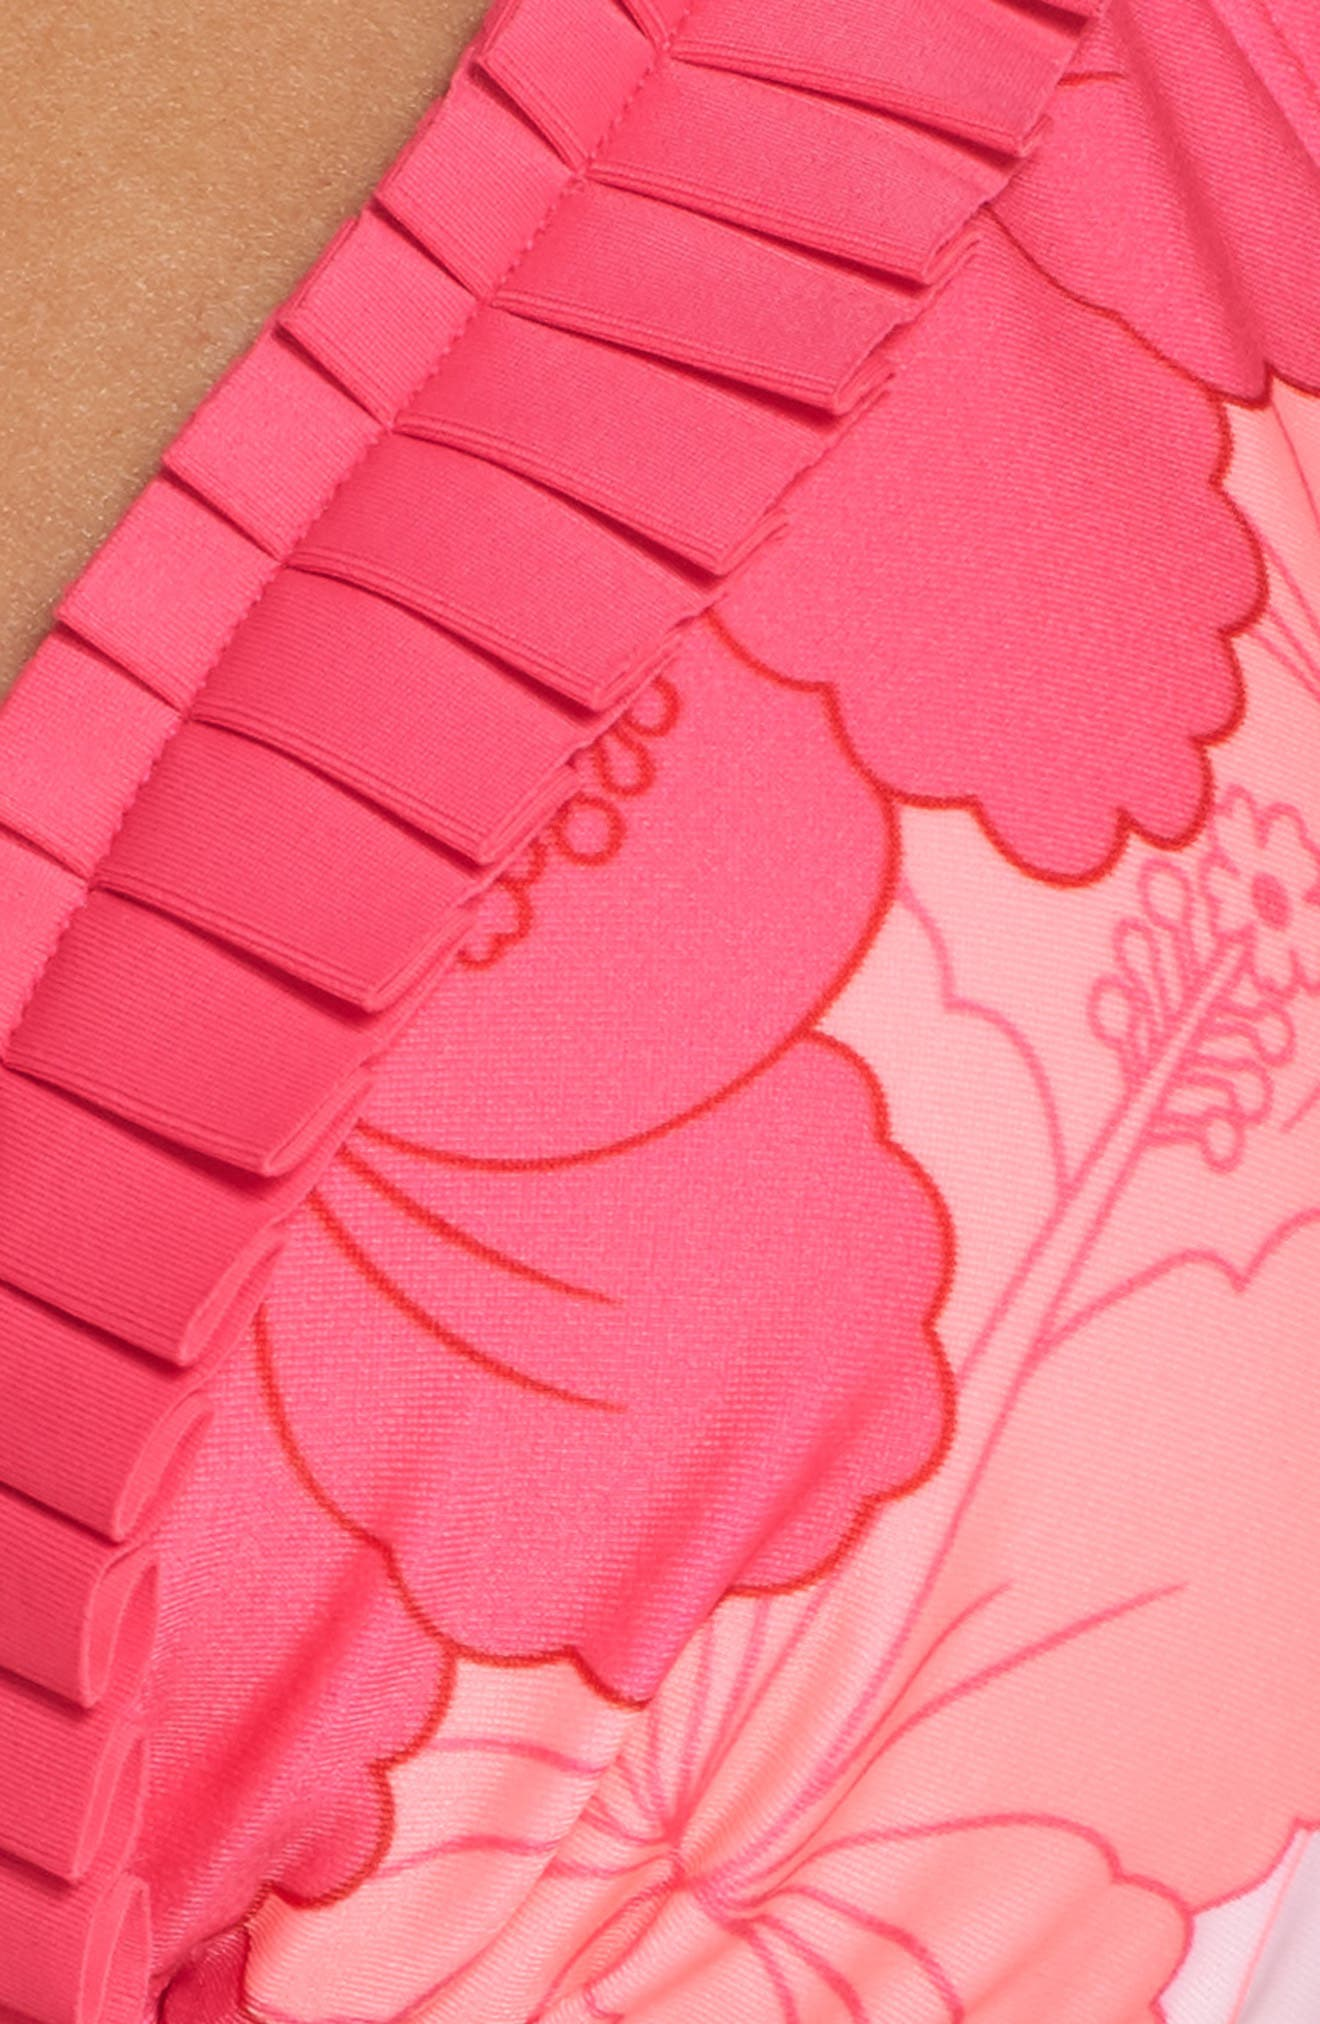 Elidii Triangle Bikini Top,                             Alternate thumbnail 8, color,                             Neon Pink